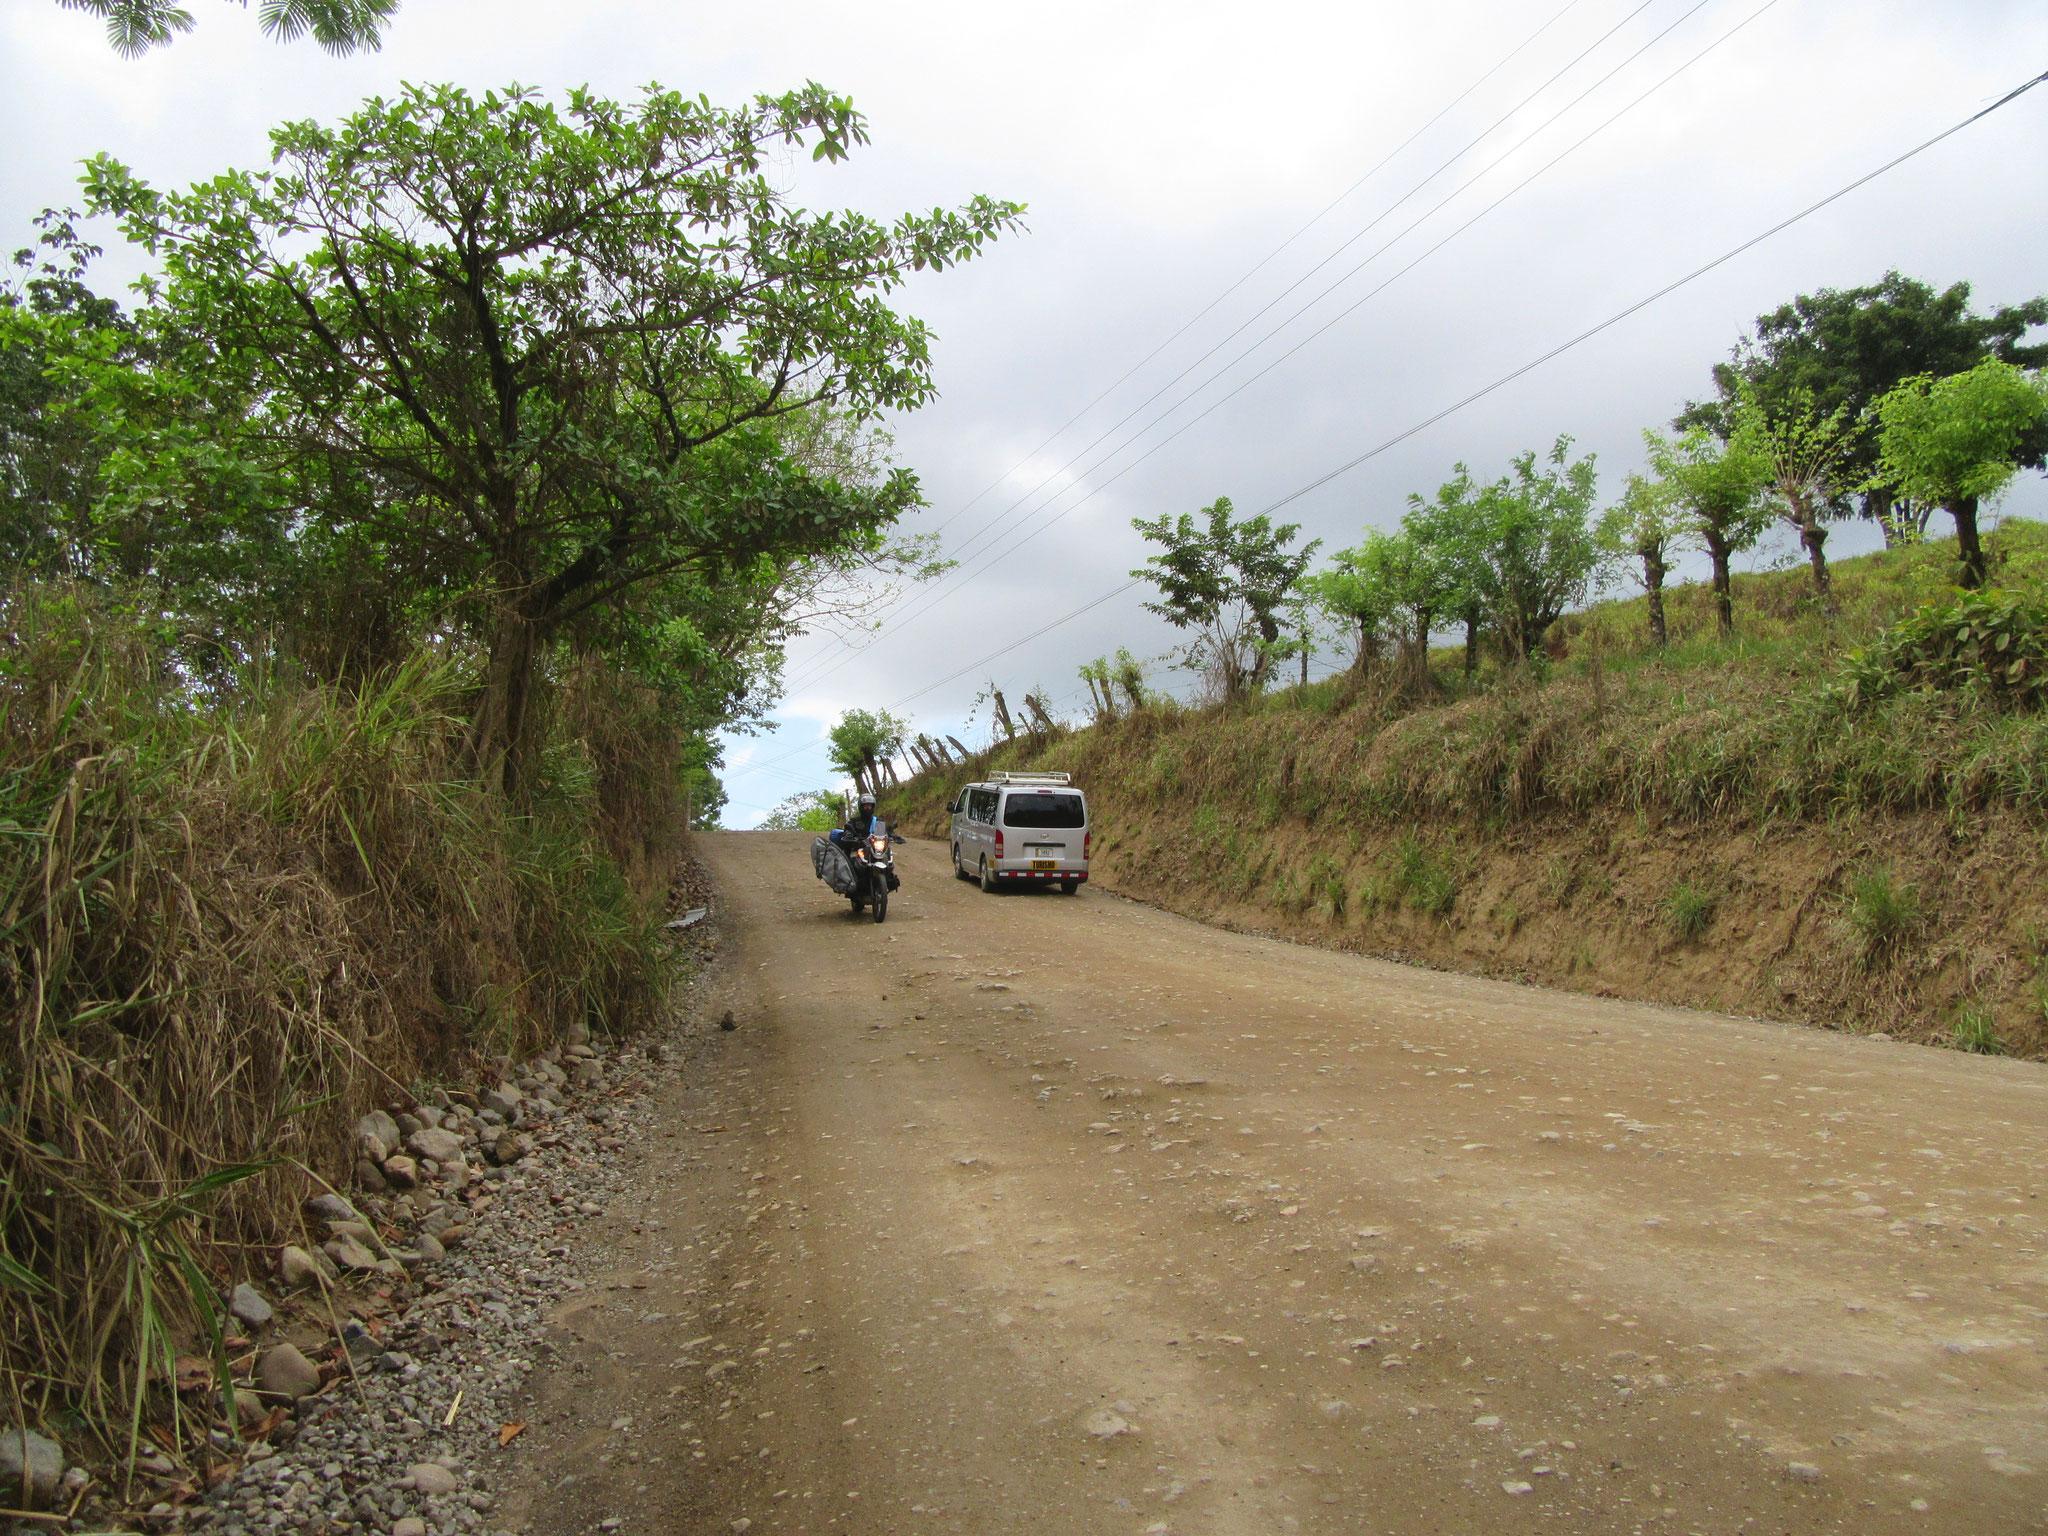 Driving to Santa Teresa